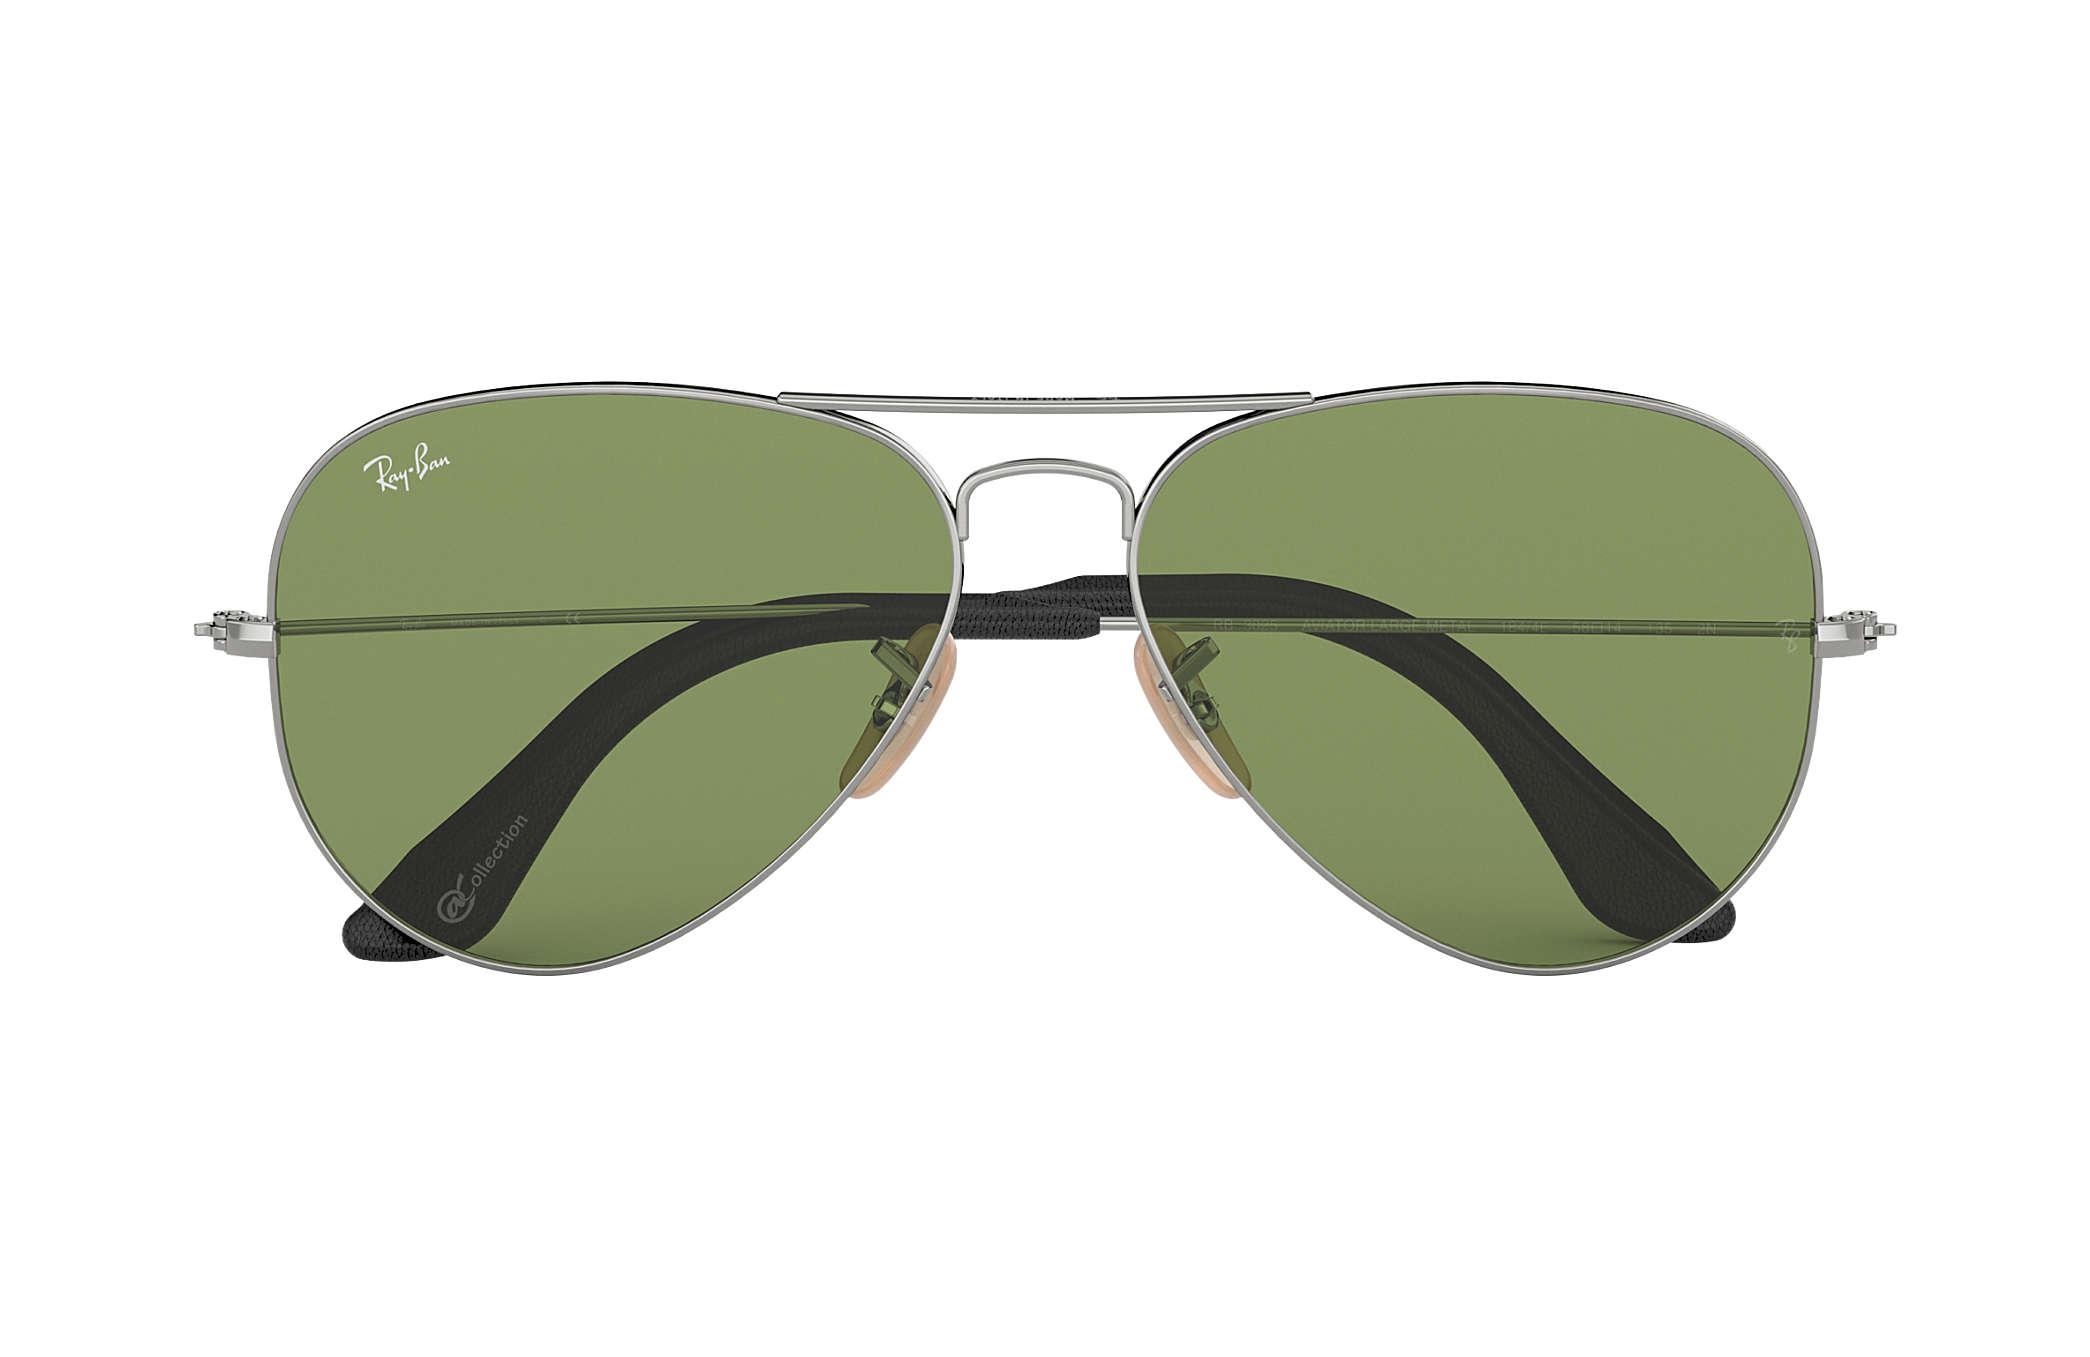 Ray Ban Aviators Sunglasses Rb3025 « Heritage Malta b6be3af36e